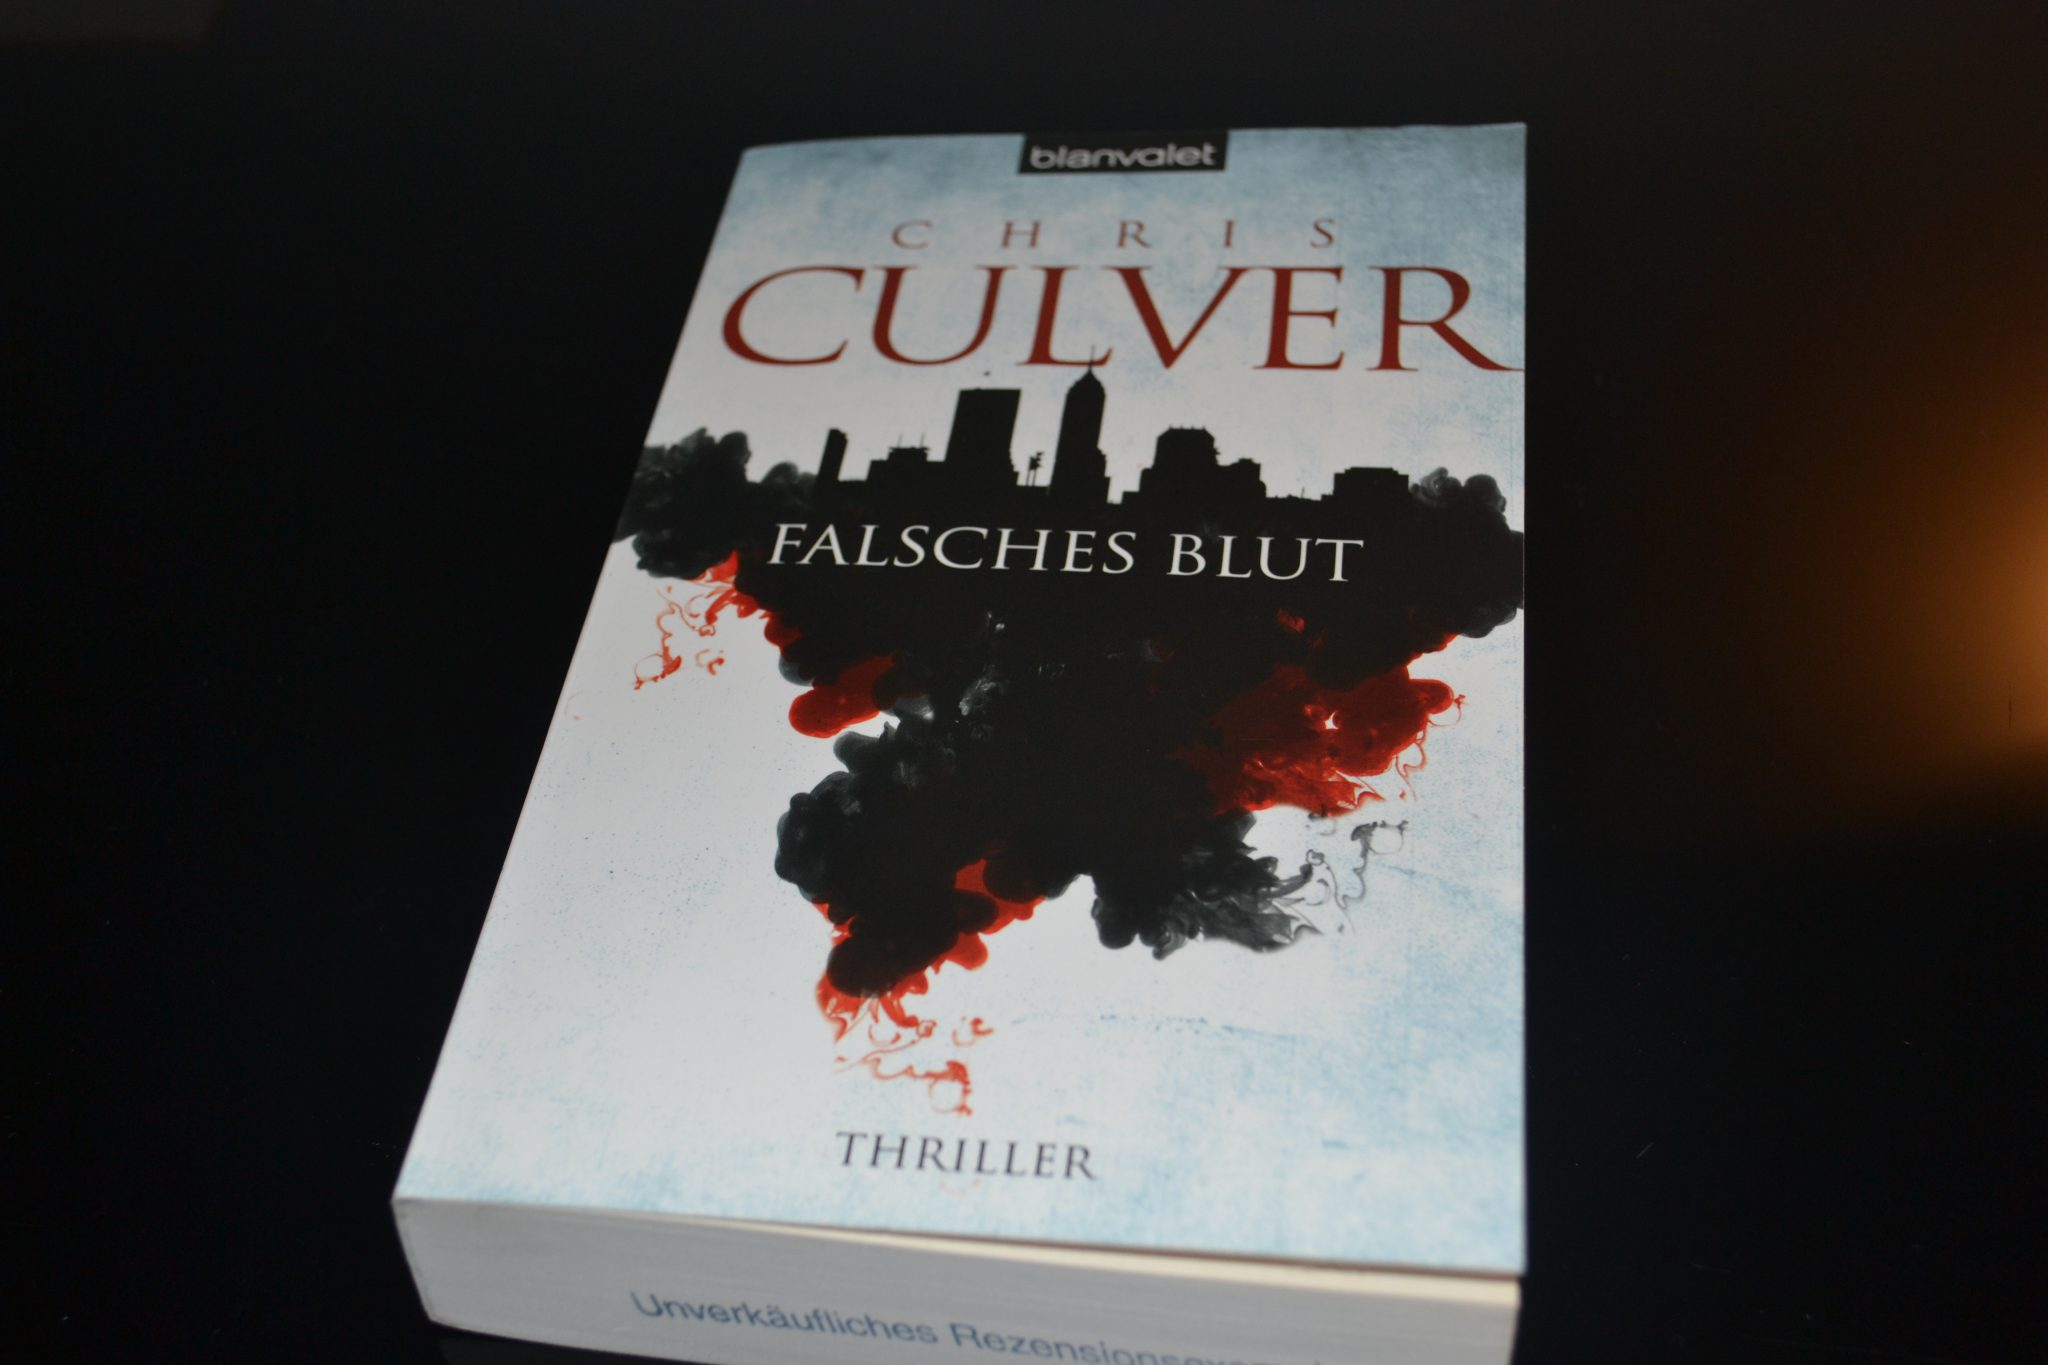 Books: Falsches Blut | Chris Culver - DSC 0003